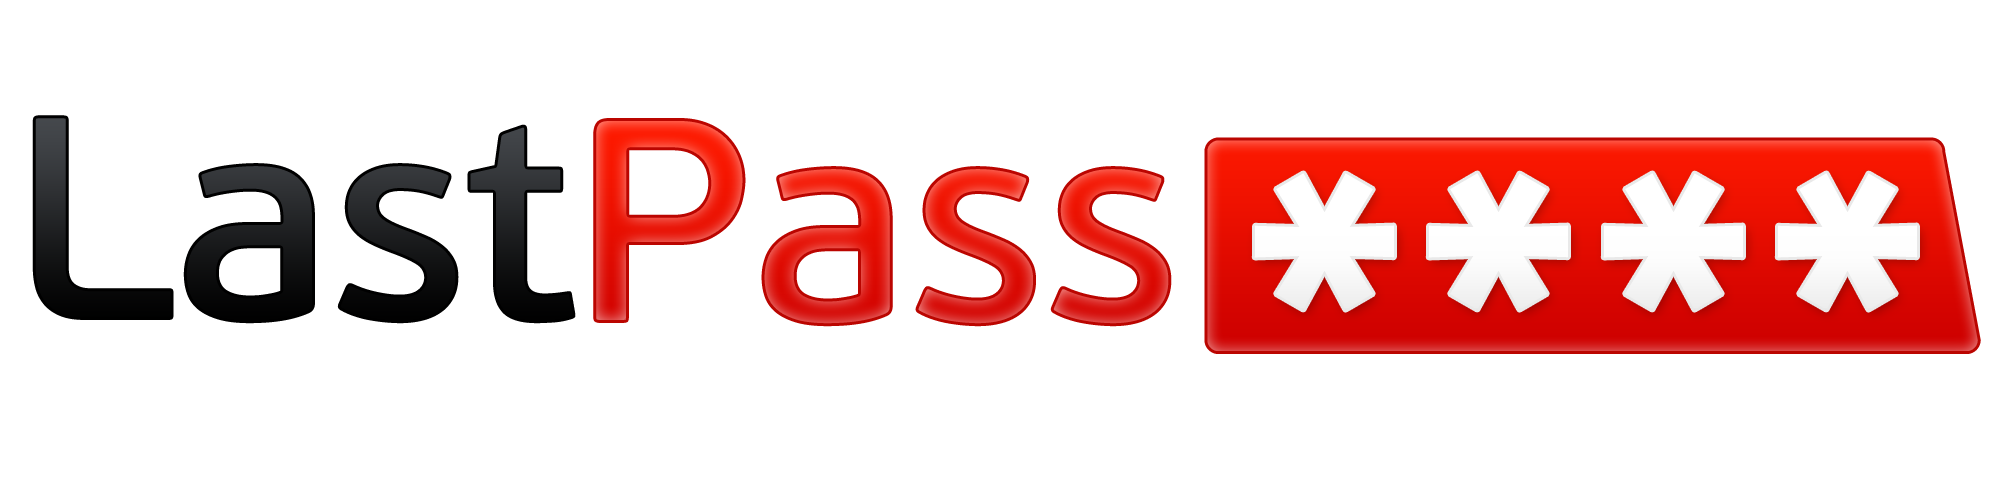 Lastpass www.lastpass.com